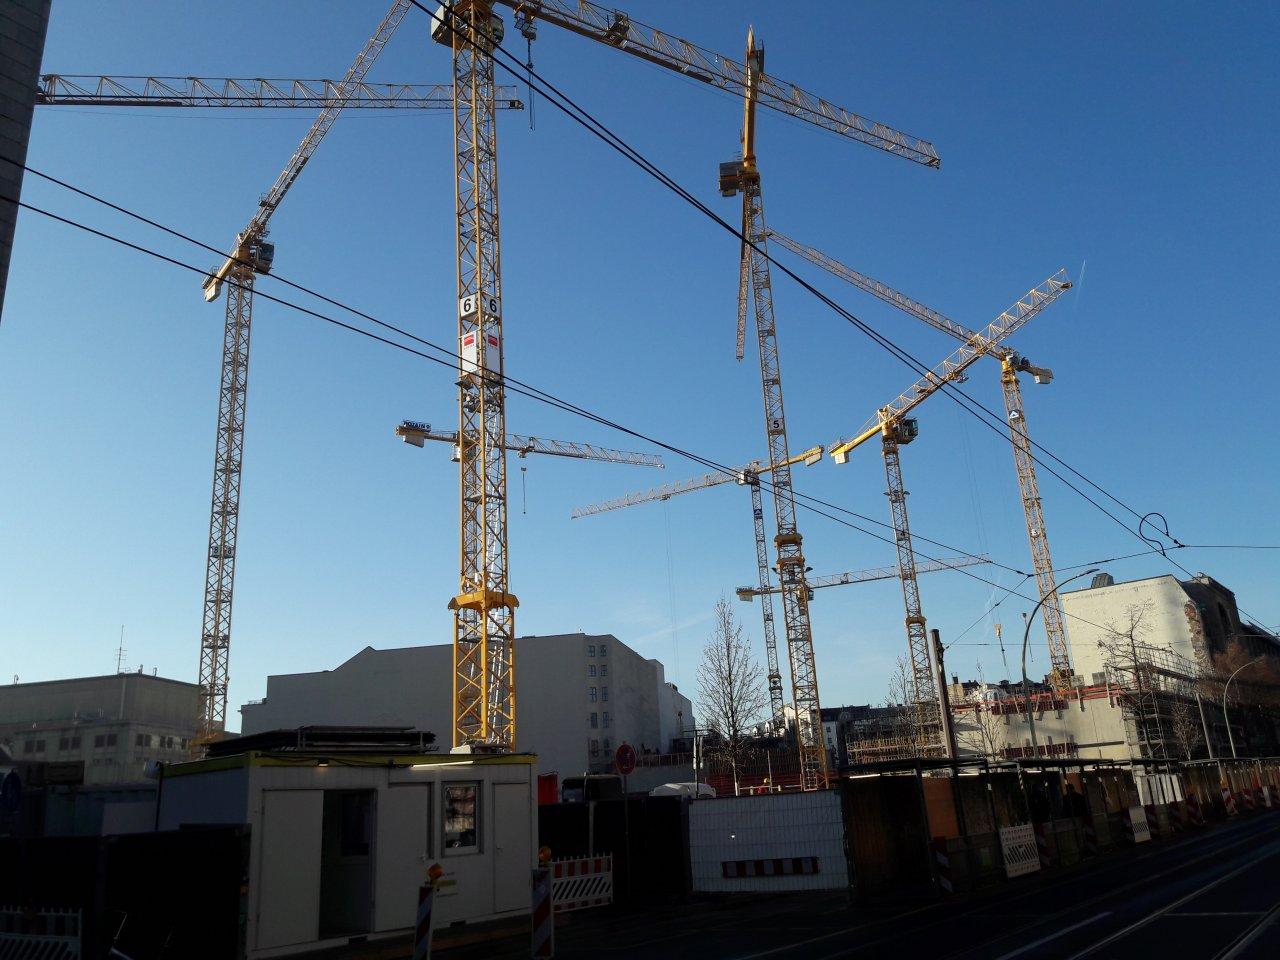 Tacheles-Bauprojekt-Baustelle.jpg